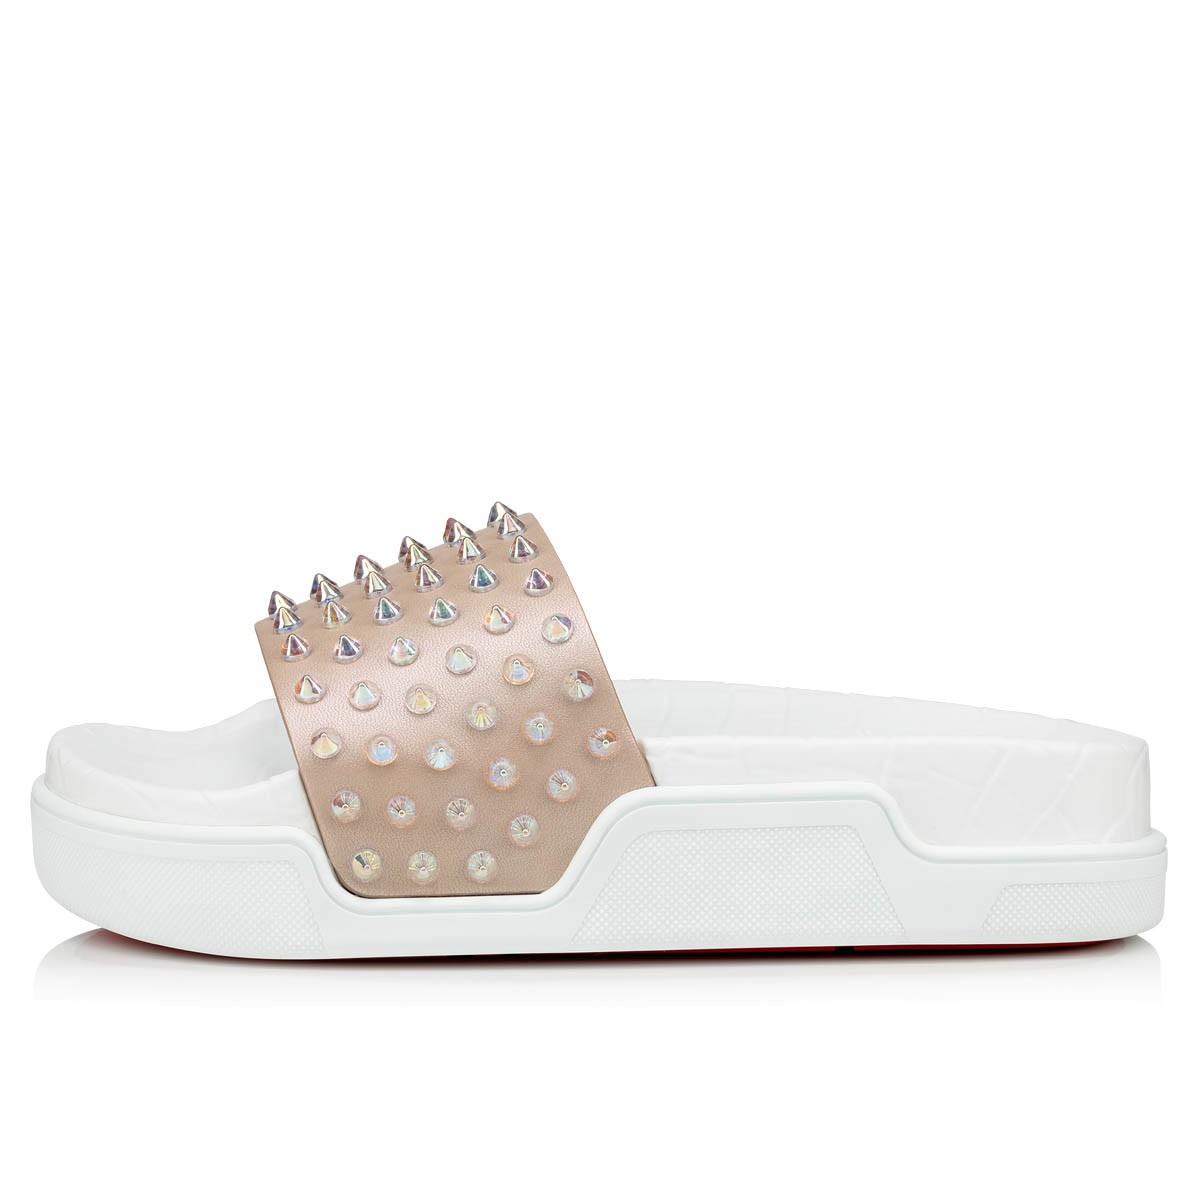 Women Shoes - Pool Fun Donna 000 Nappa - Christian Louboutin